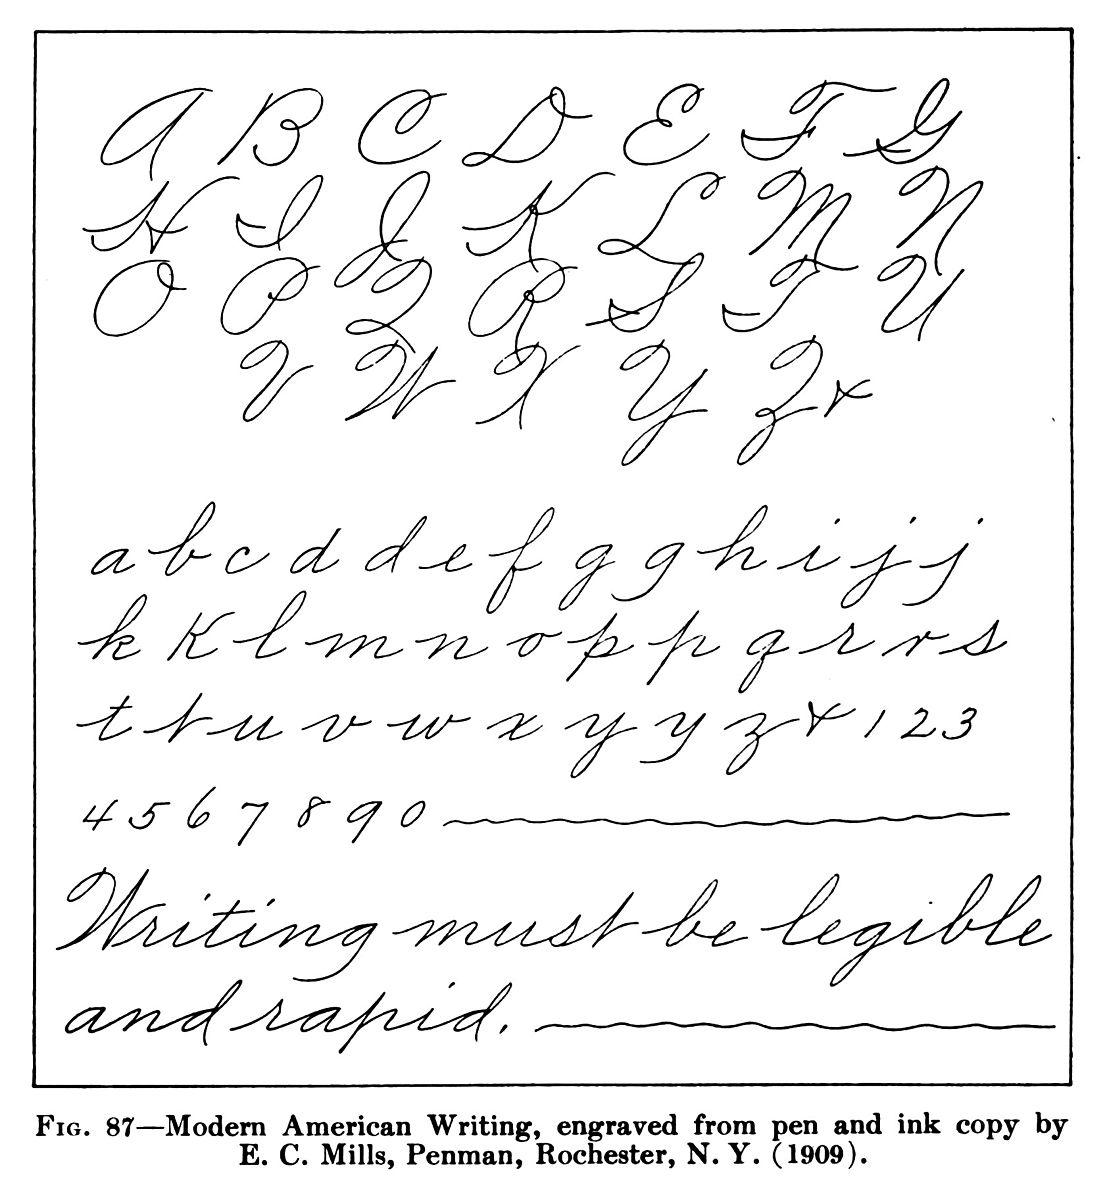 Mills alphabet